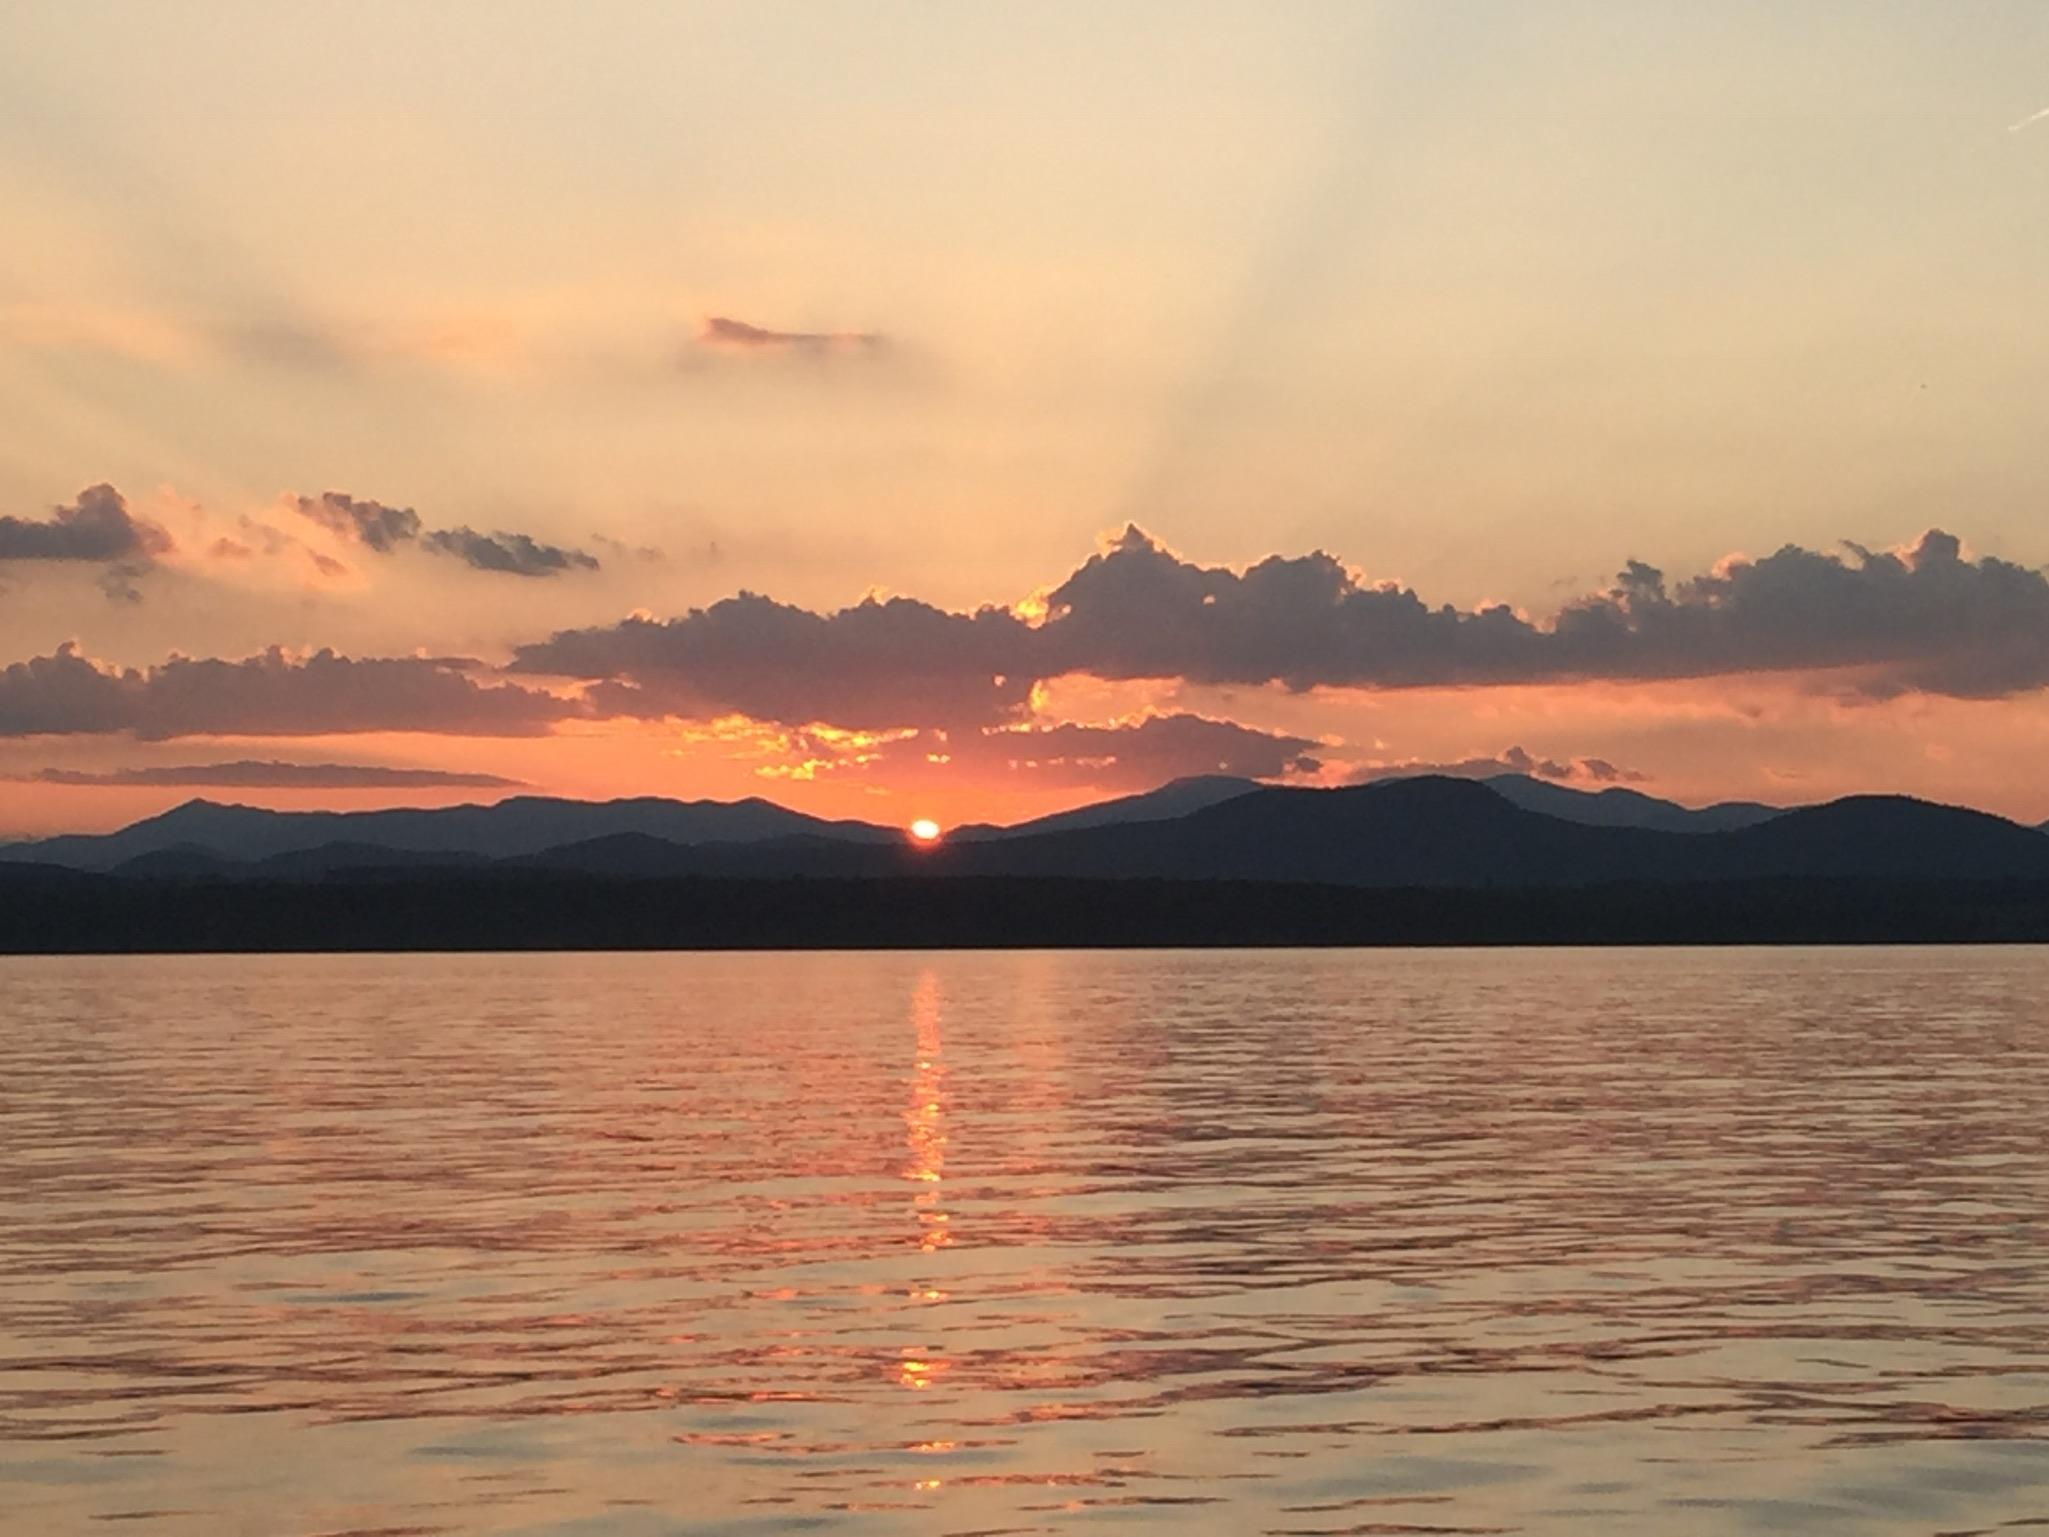 Sunset View from Garden Island